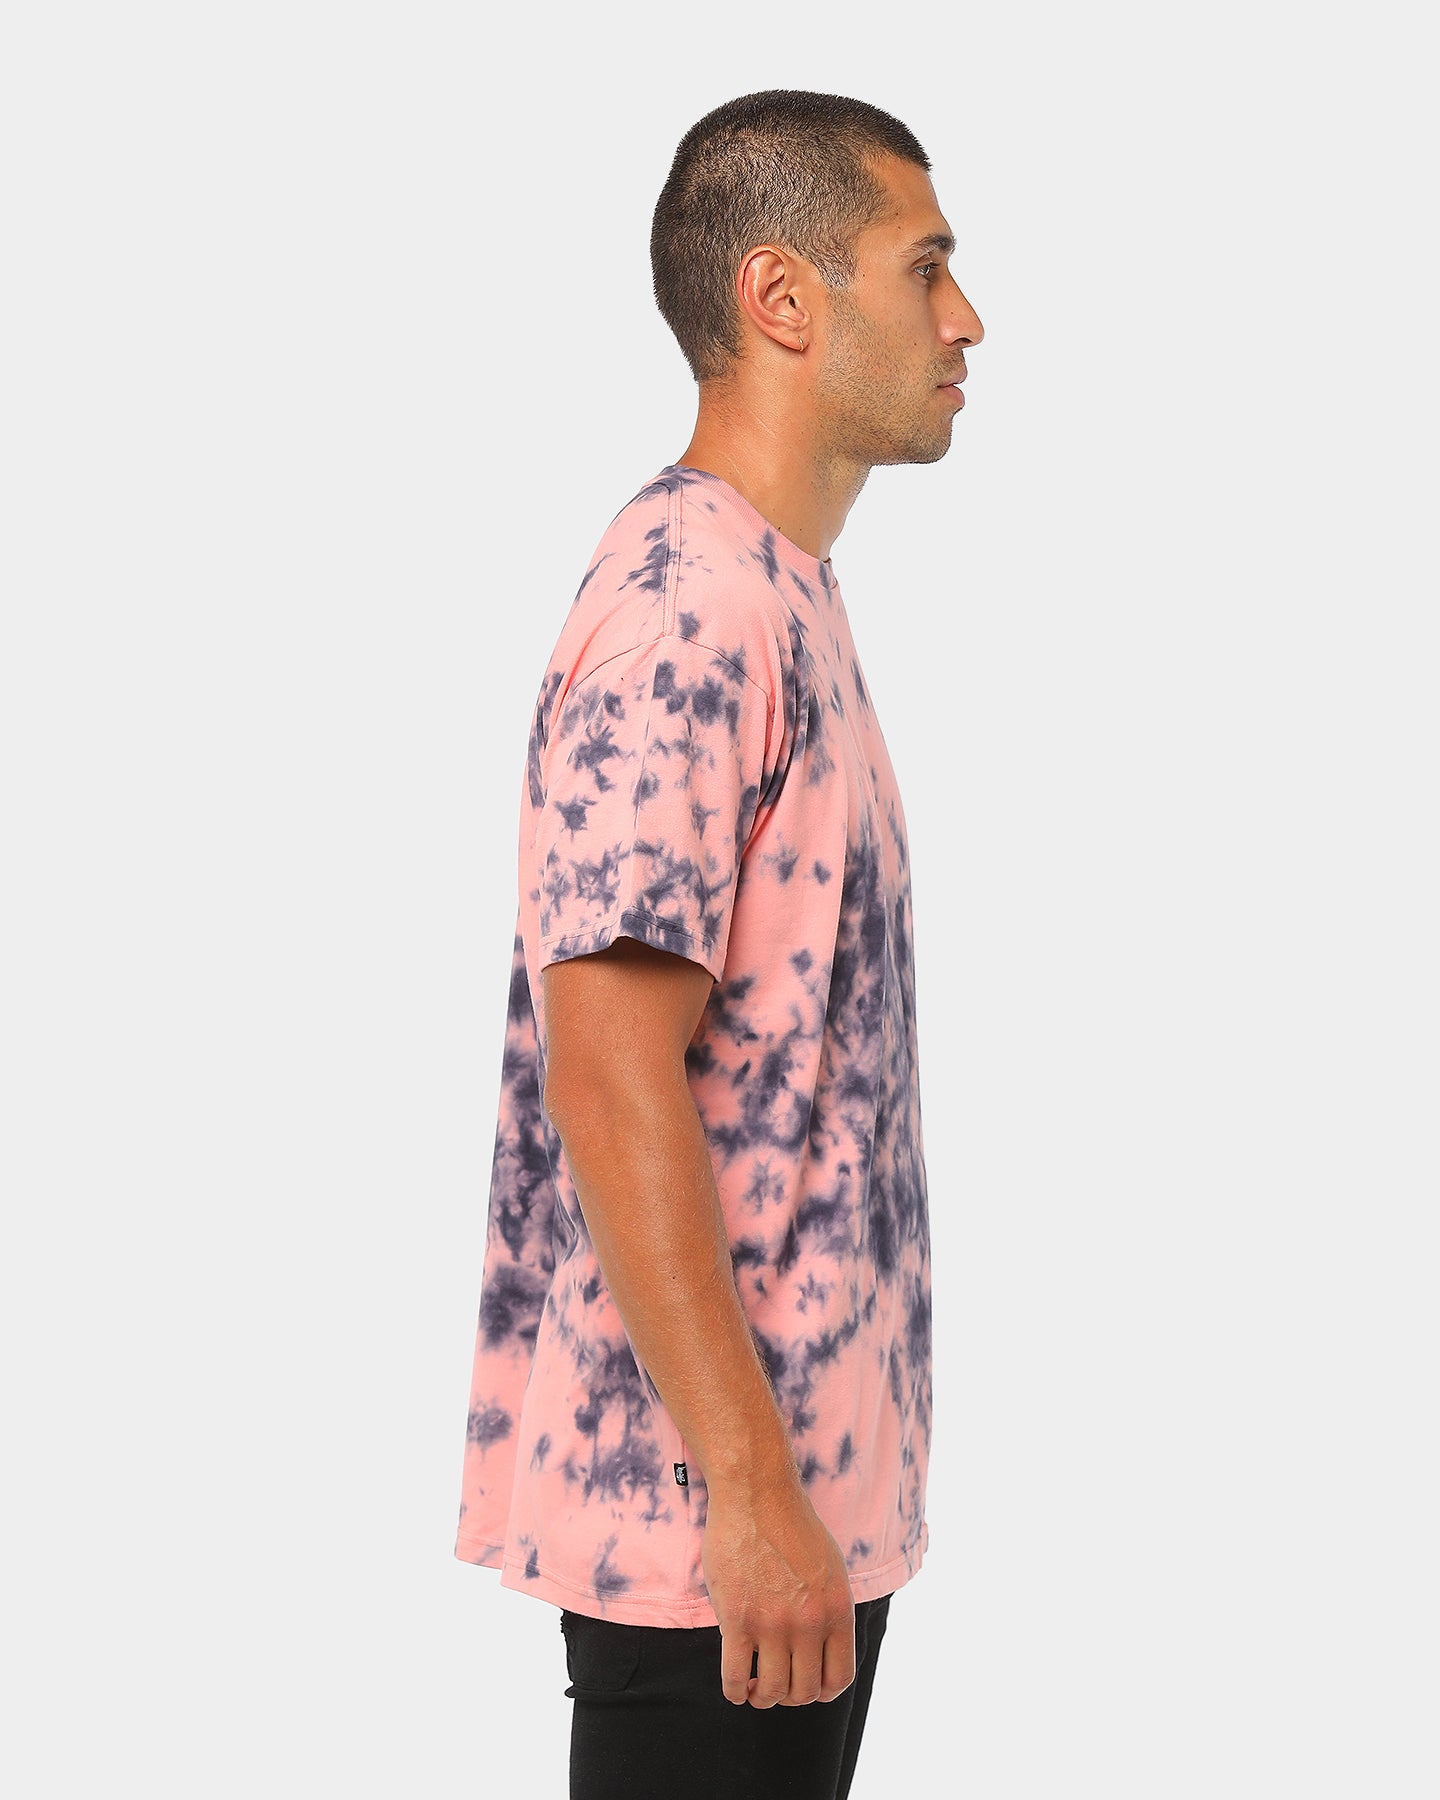 Basic Stussy Peach Color T shirt size XS 5XL